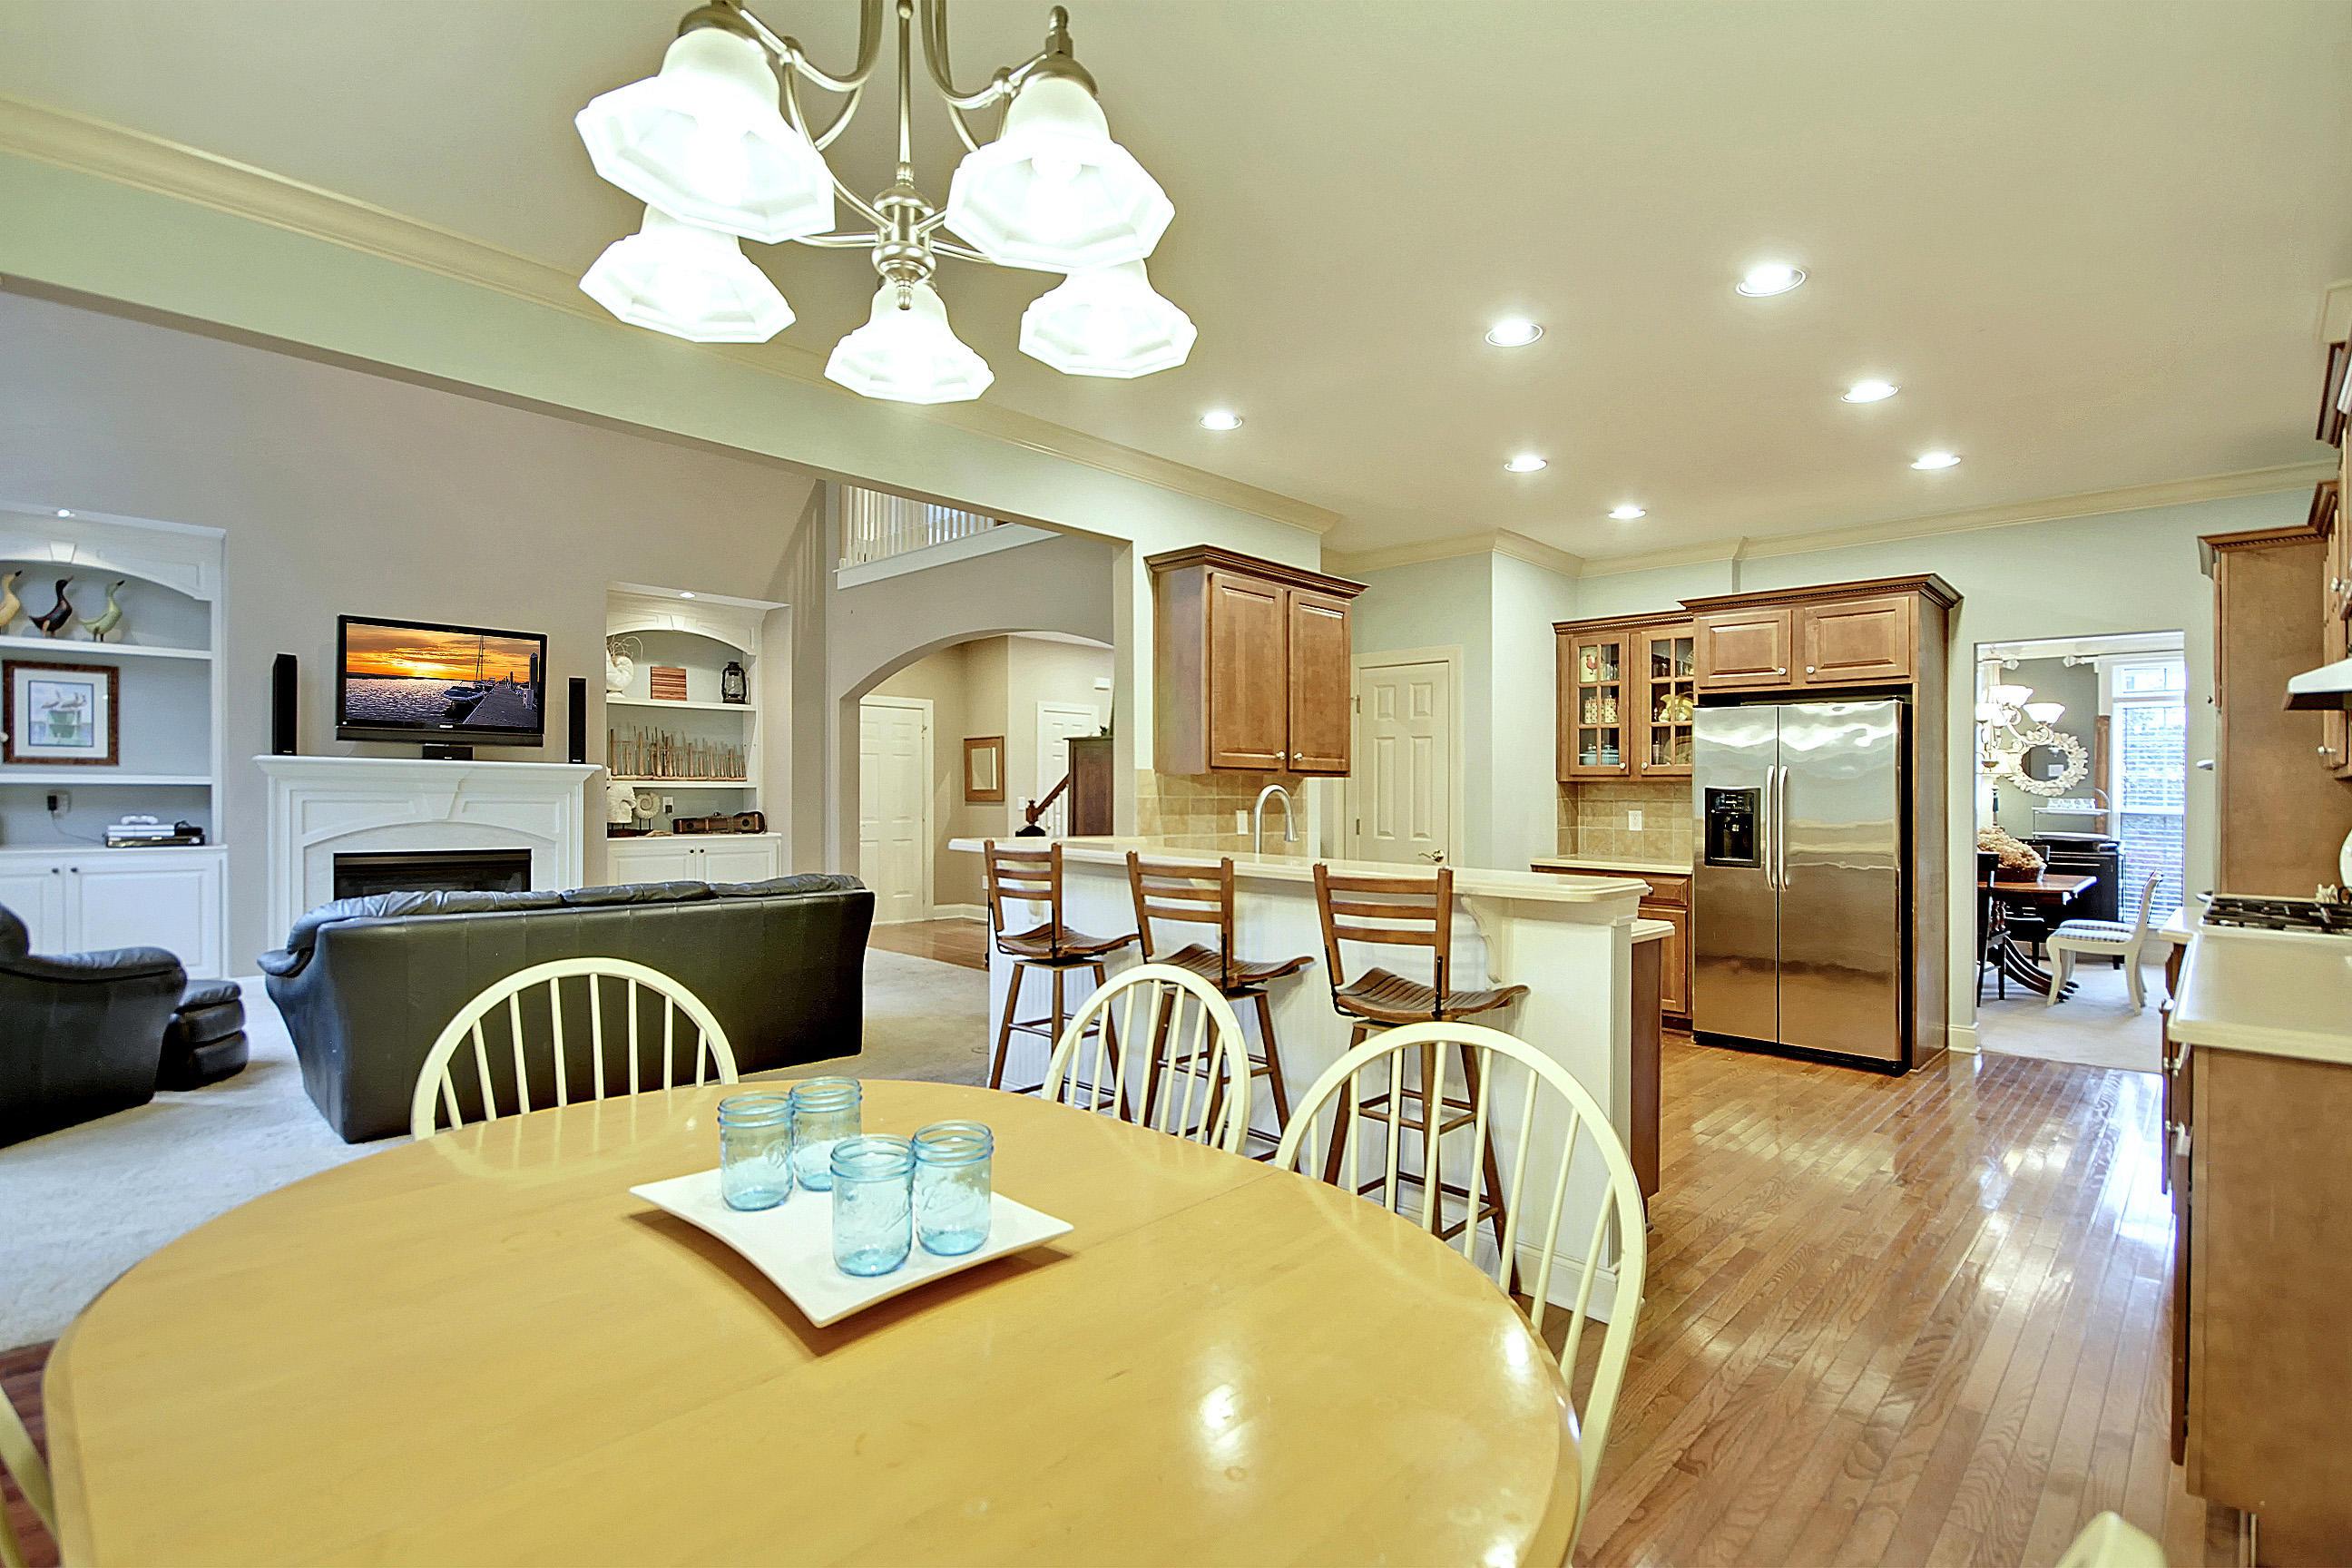 Dunes West Homes For Sale - 2449 Darts Cove, Mount Pleasant, SC - 2